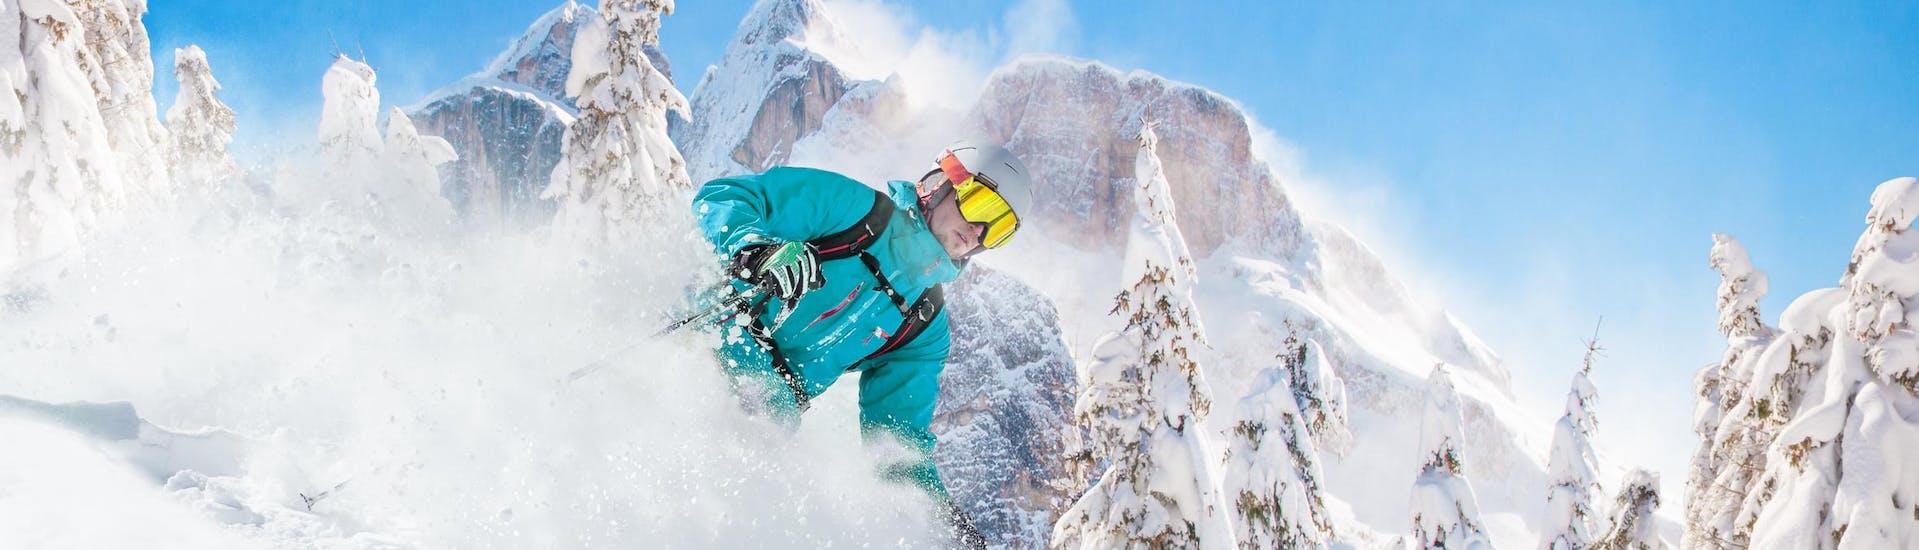 "Freeriding Private ""Family & Friends"" - All Levels avec Ski- & Snowboardschule Ankogel - Hero image"